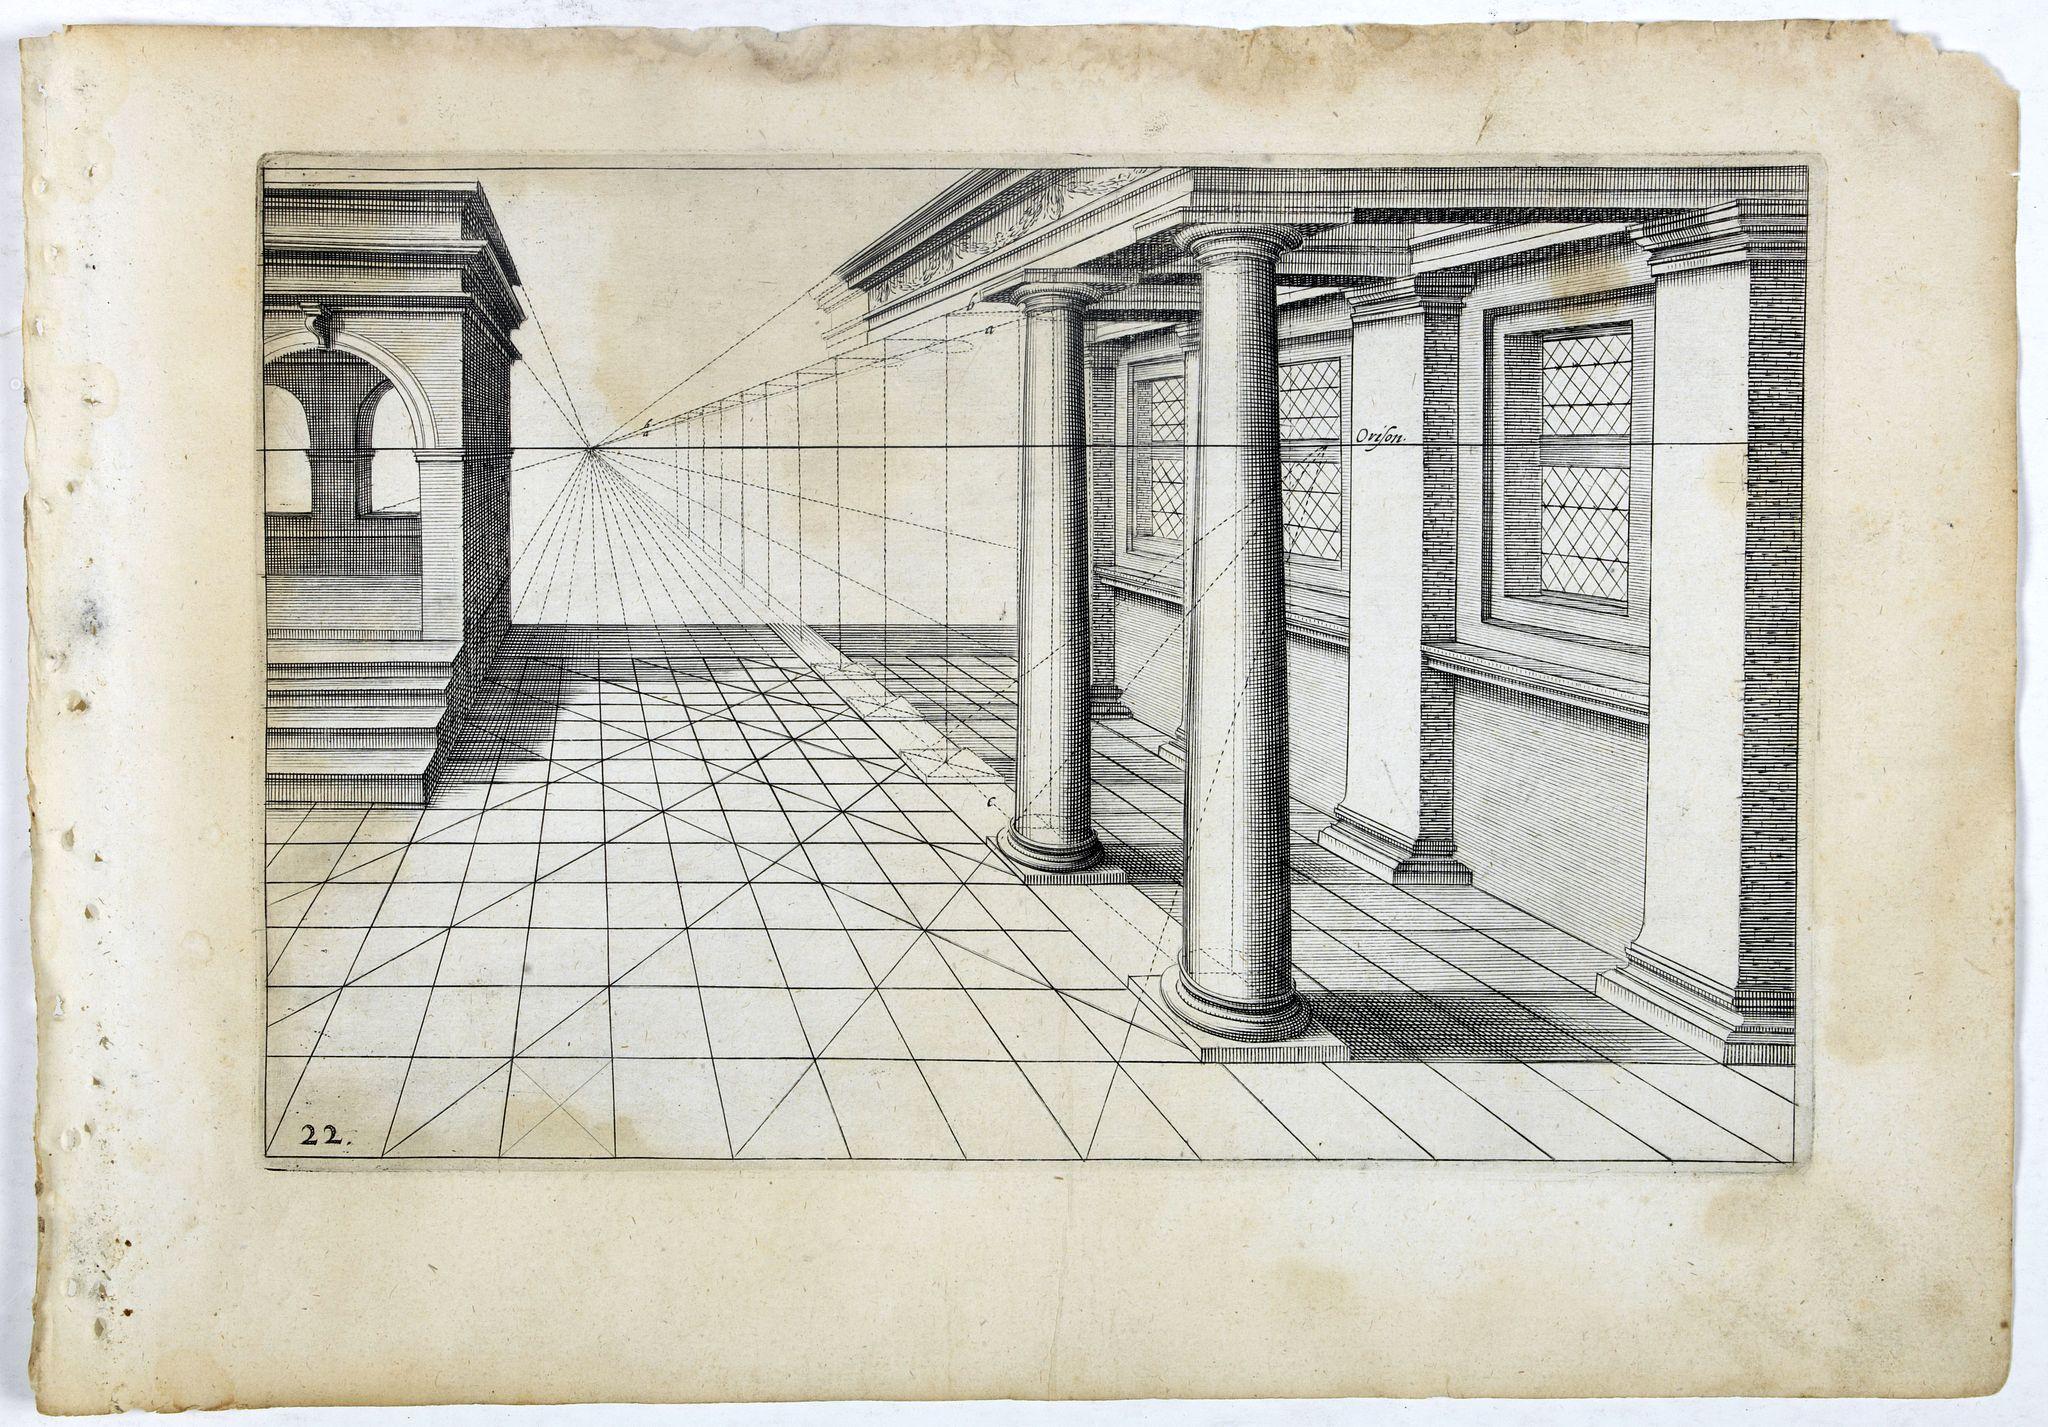 VREDEMAN DE VRIES, J. / HONDIUS, H. -  Perspective print by Vredeman de Vries. 22.